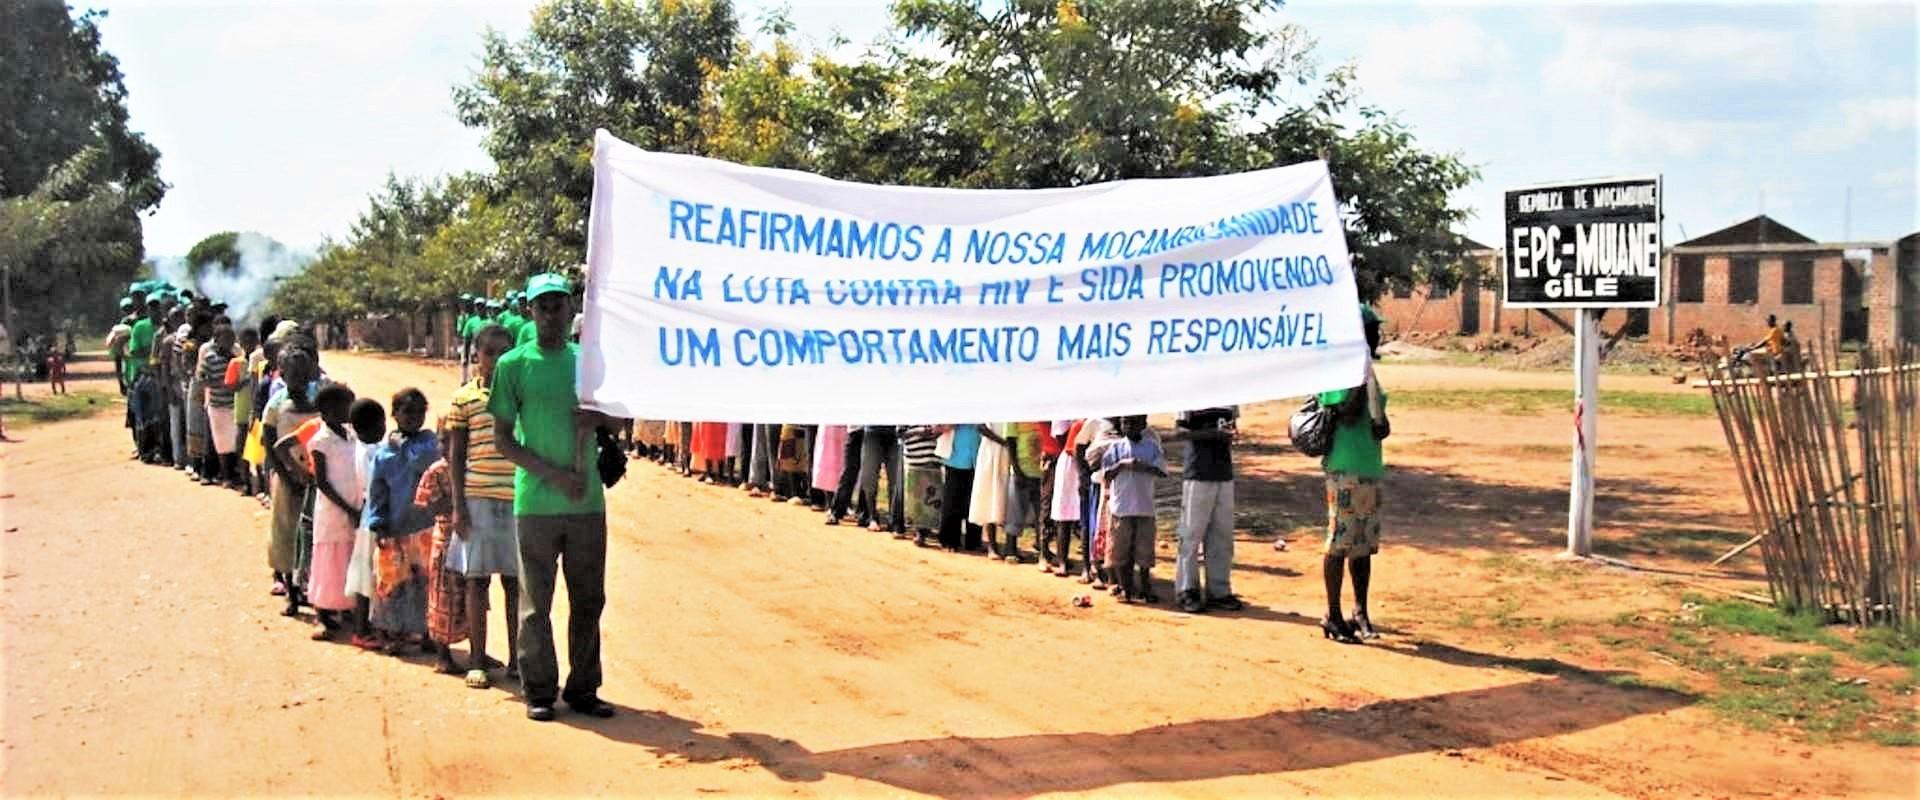 Manifestazione_Mozambico_Mani_Tese_2017